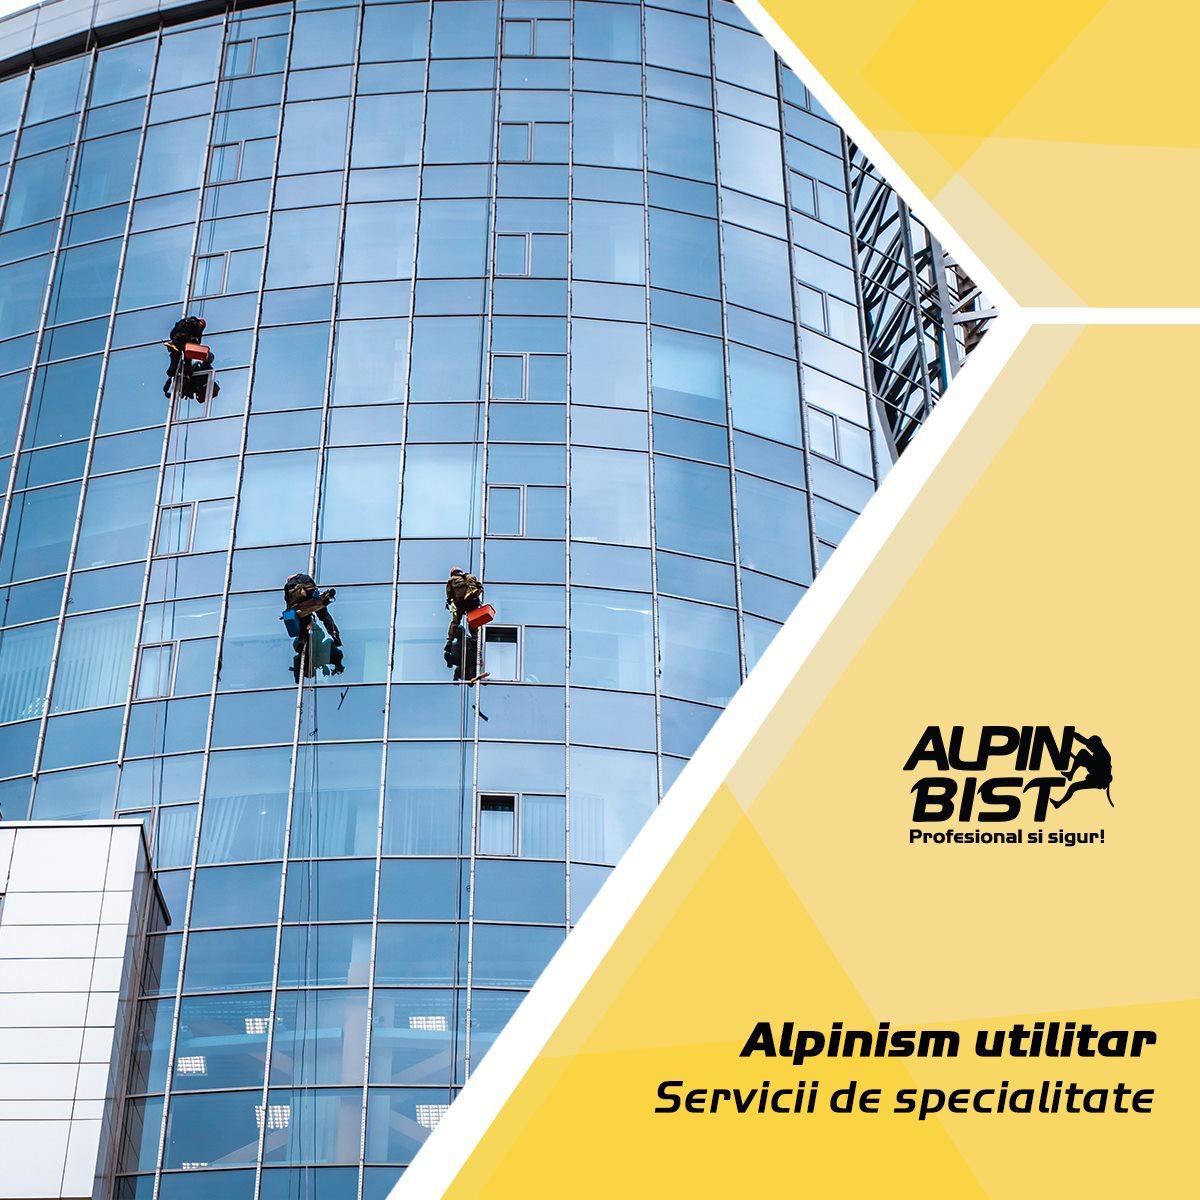 Curatare suprafete vitrate cu tehnica de alpinism utilitar